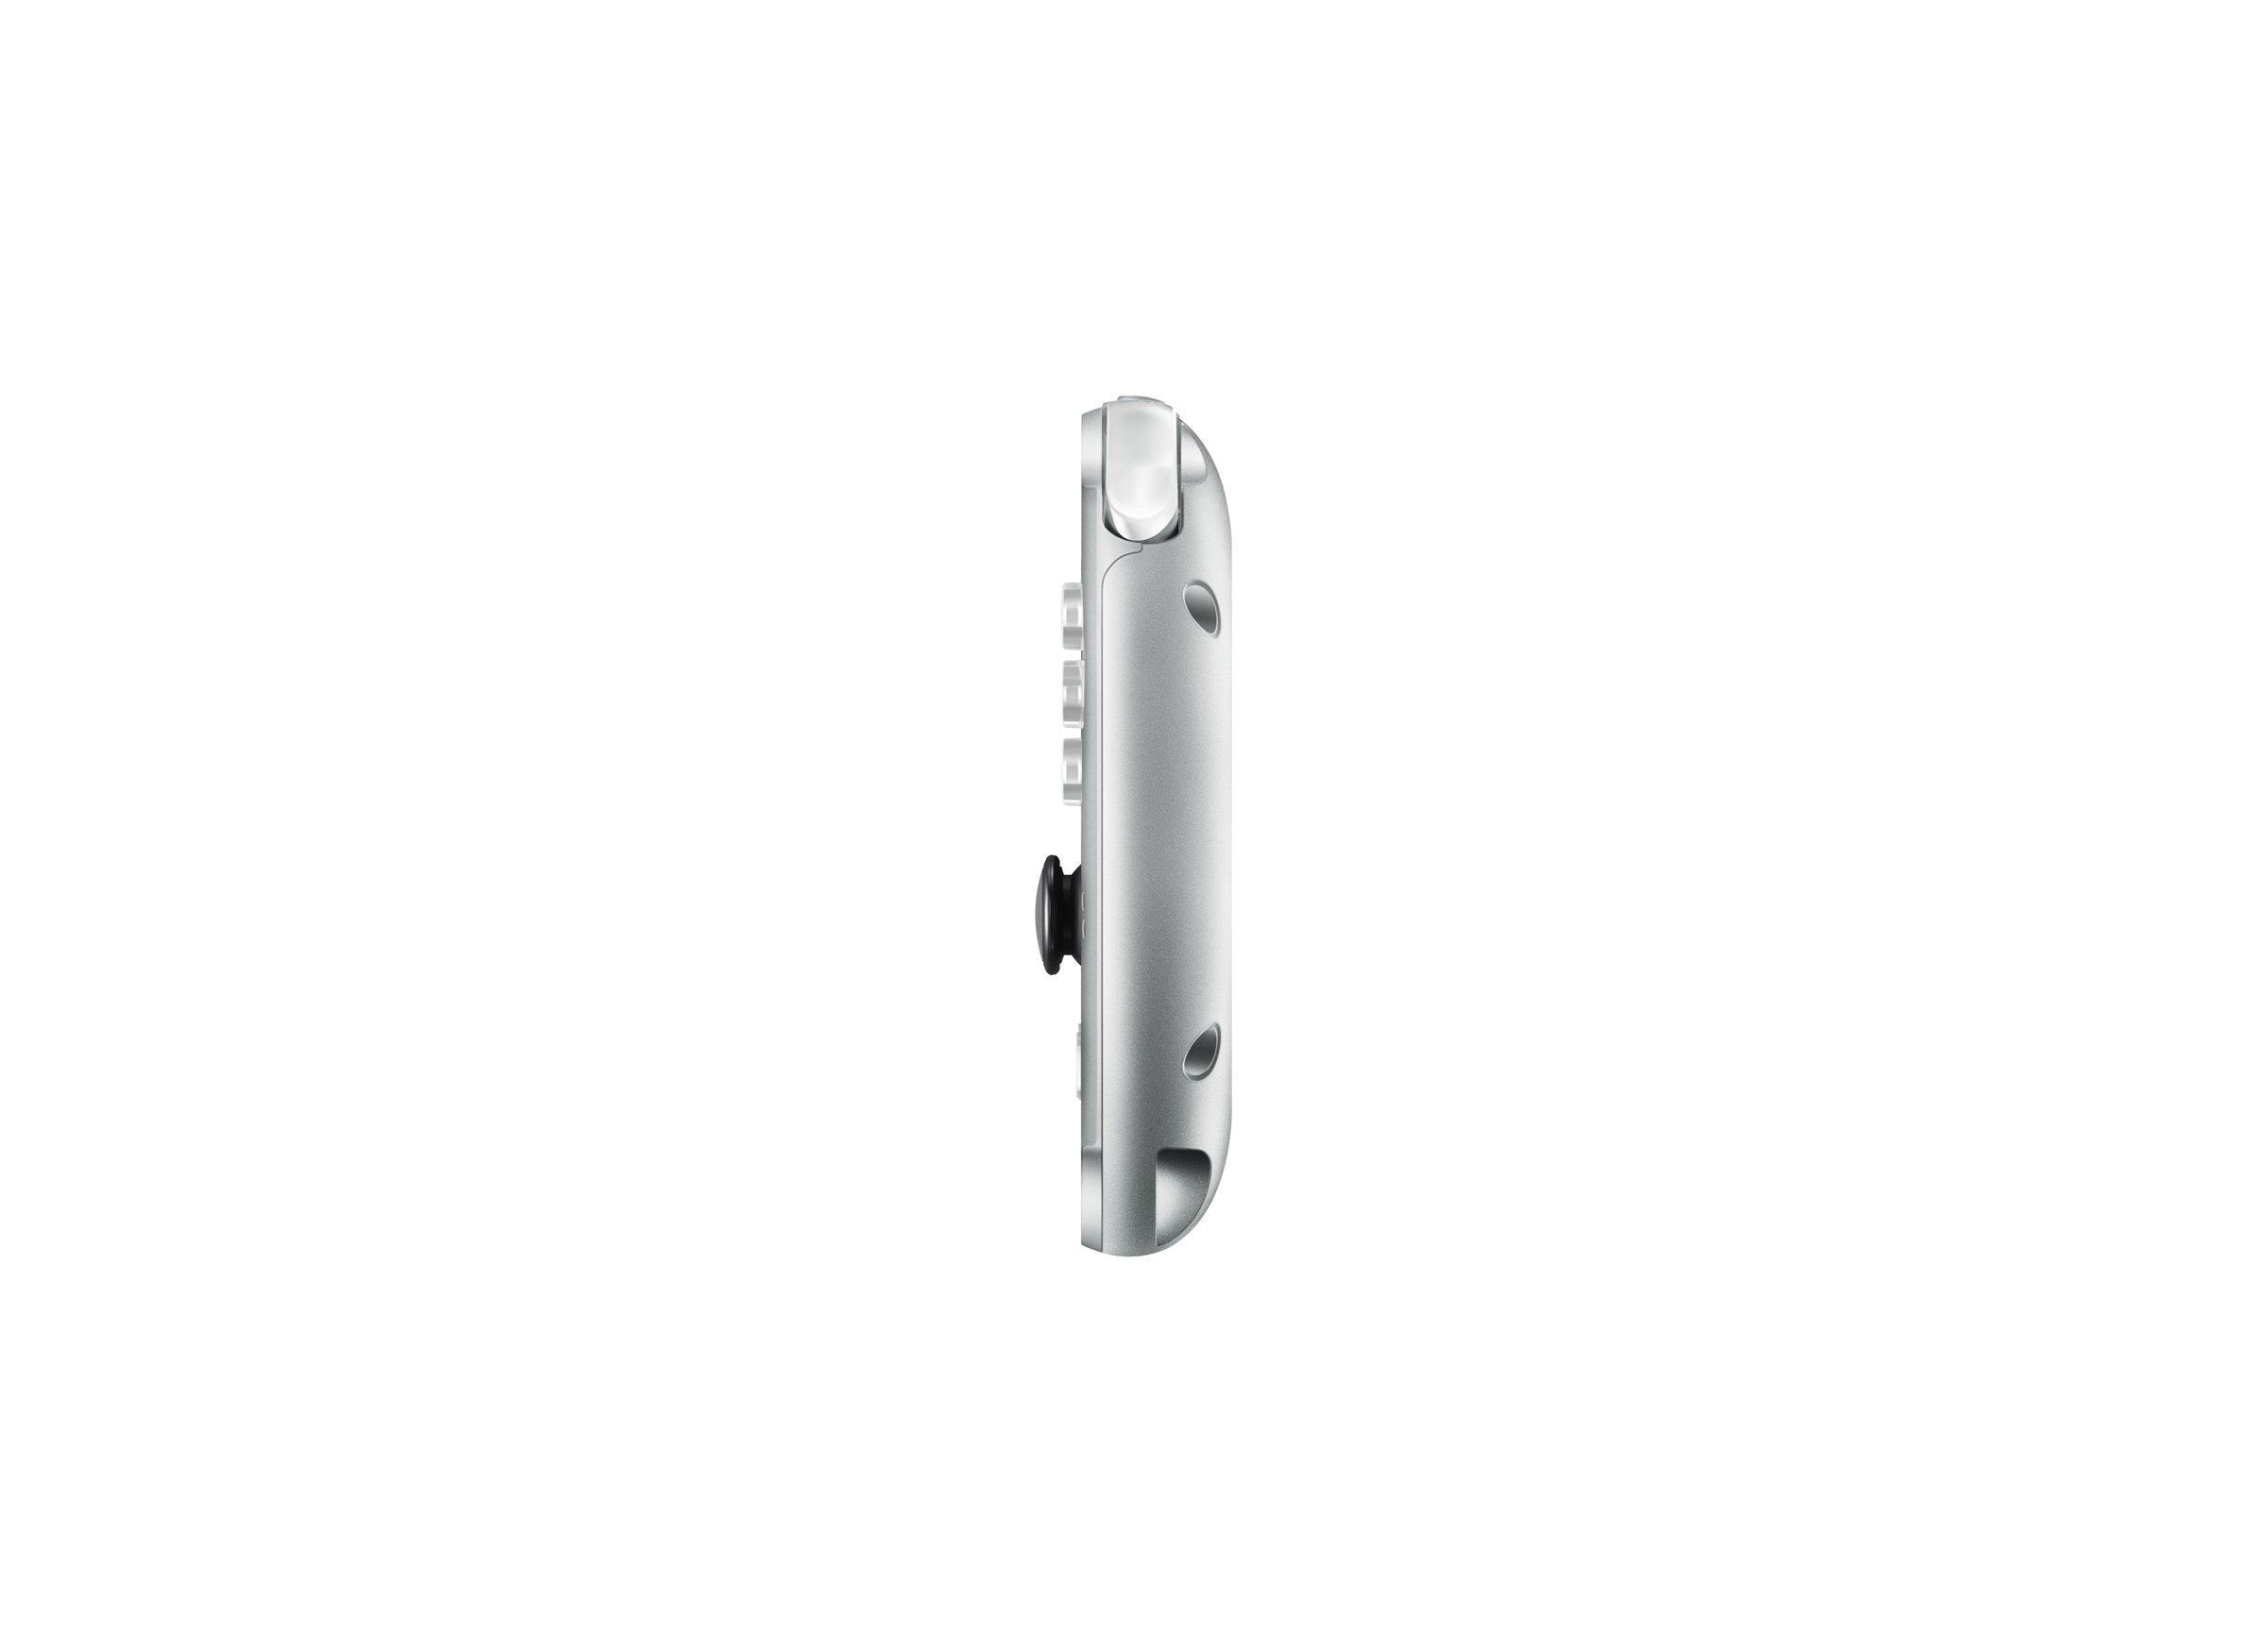 PlayStation Vita Wi-Fi Silver PCH-2000 ZA25 by PlayStation Vita (Image #10)